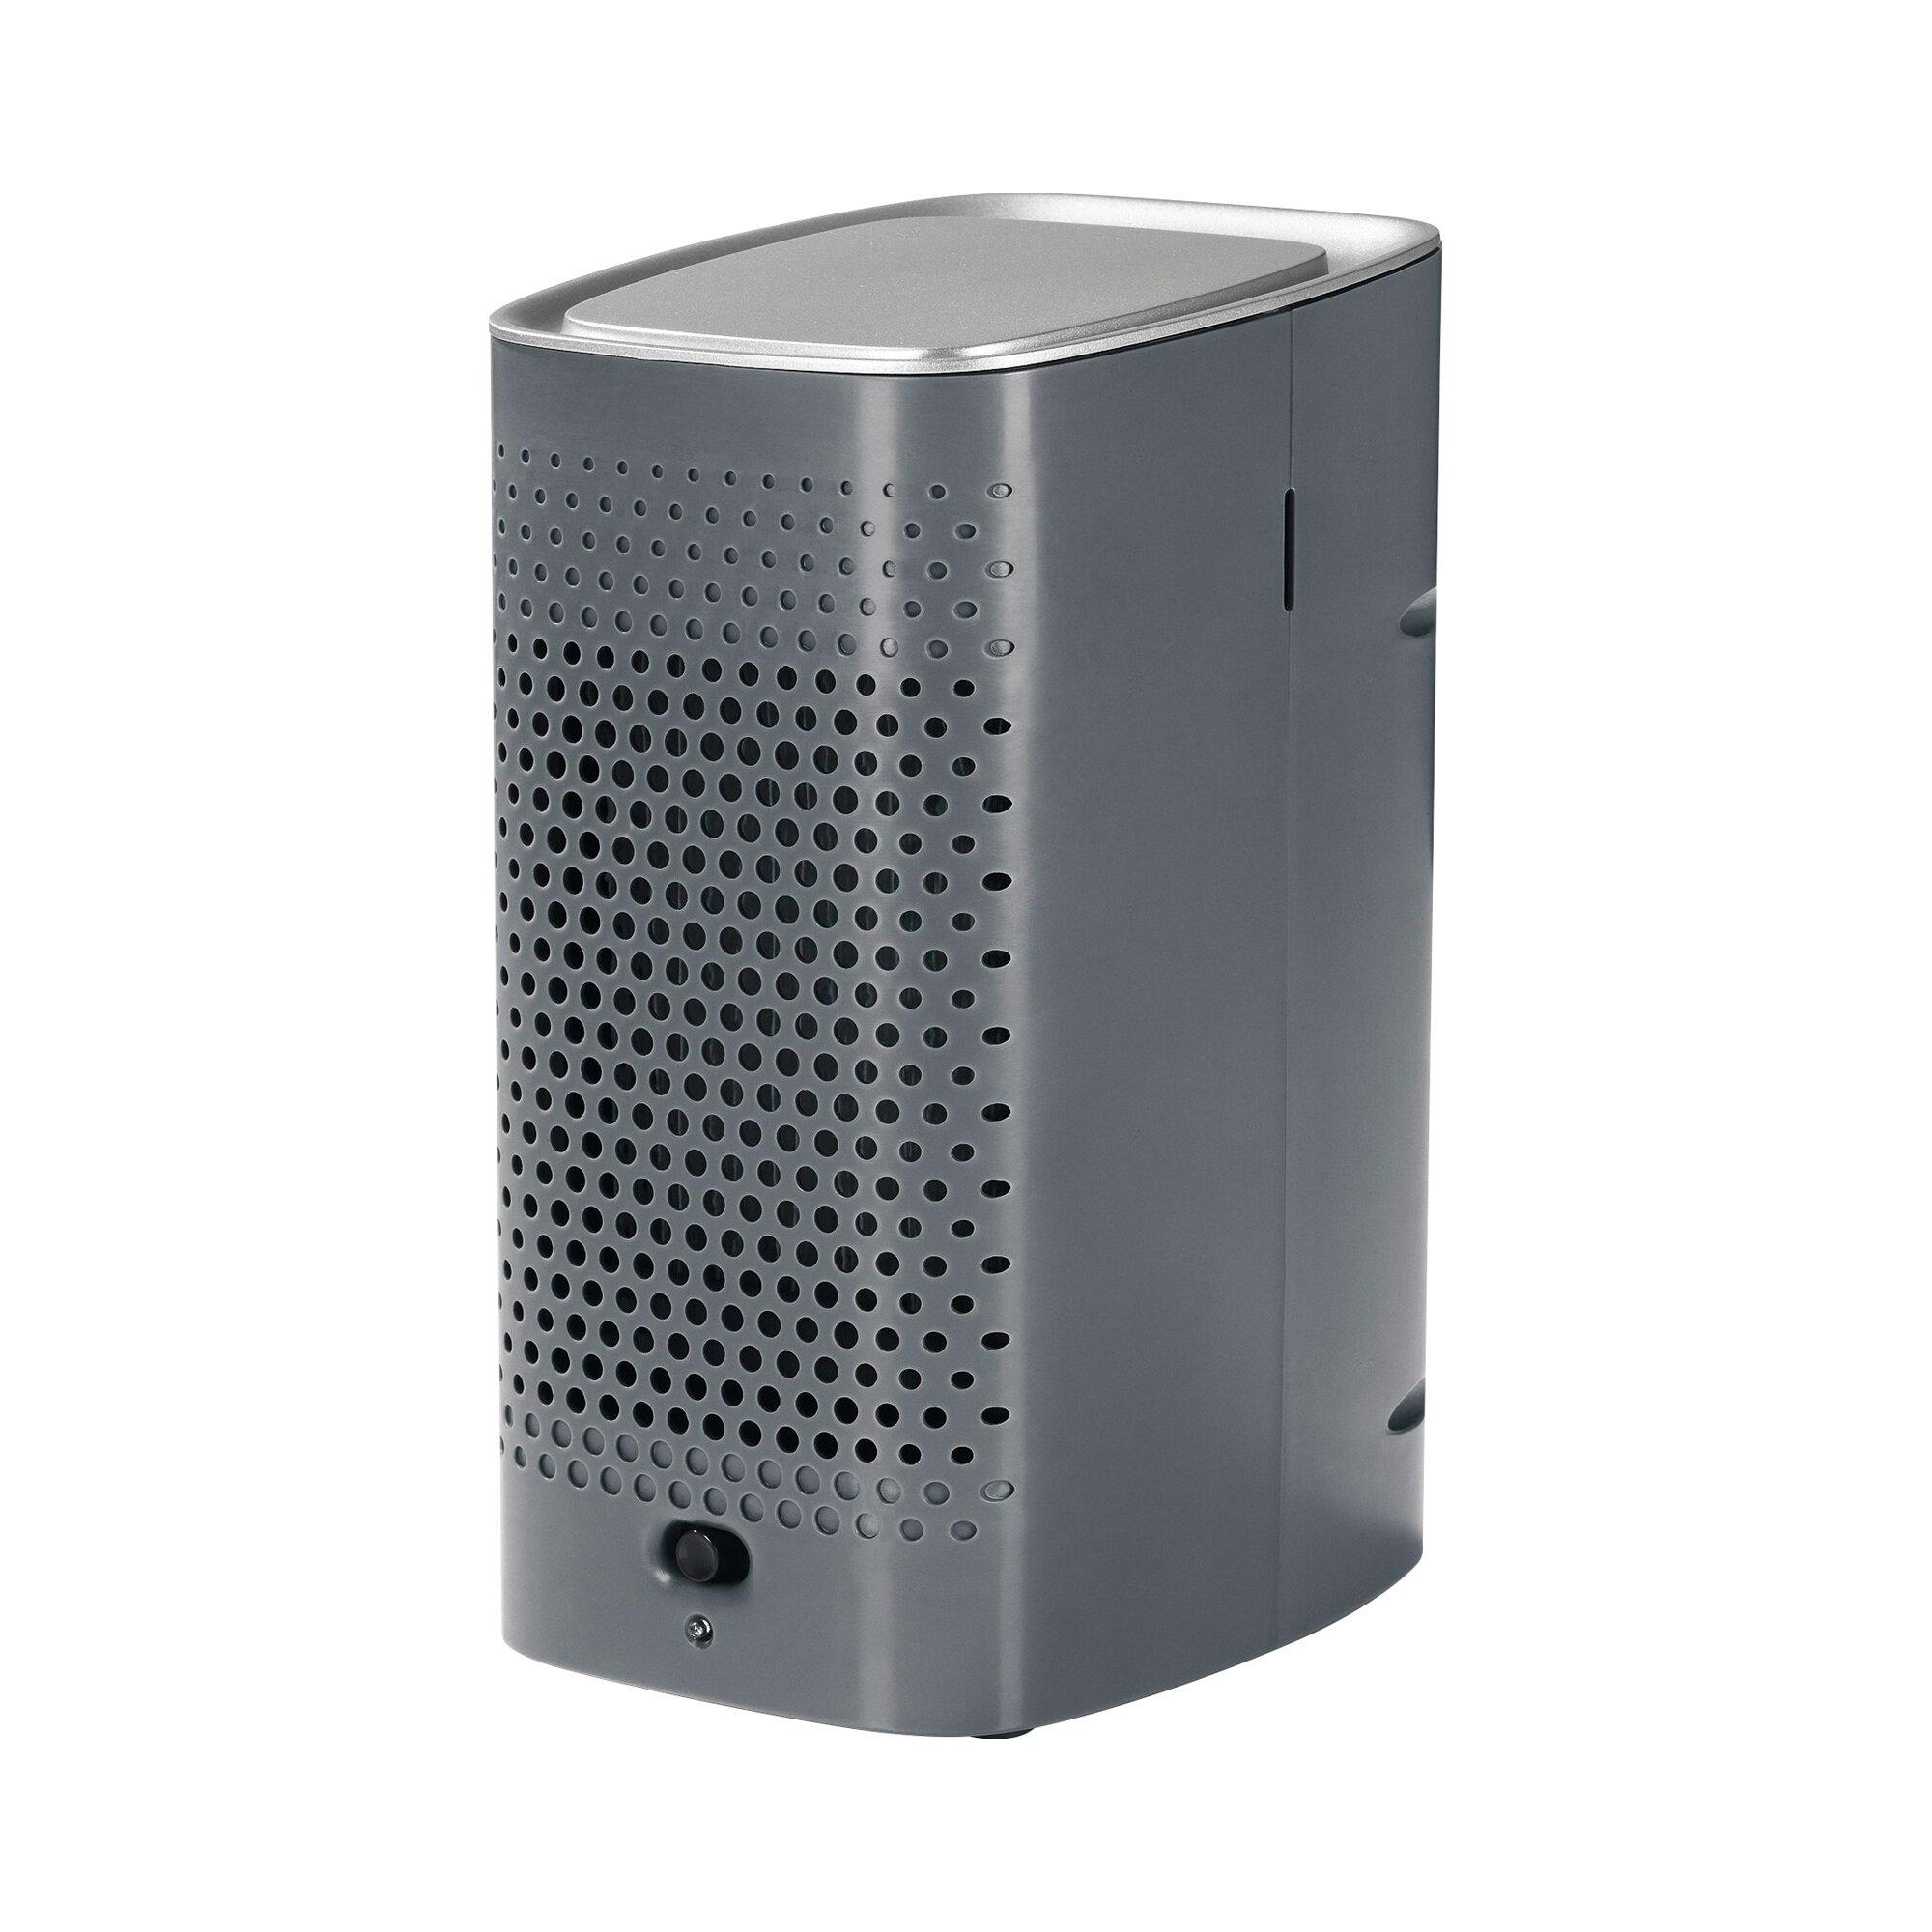 Image of EASYmaxx Kompakter Luftkühler